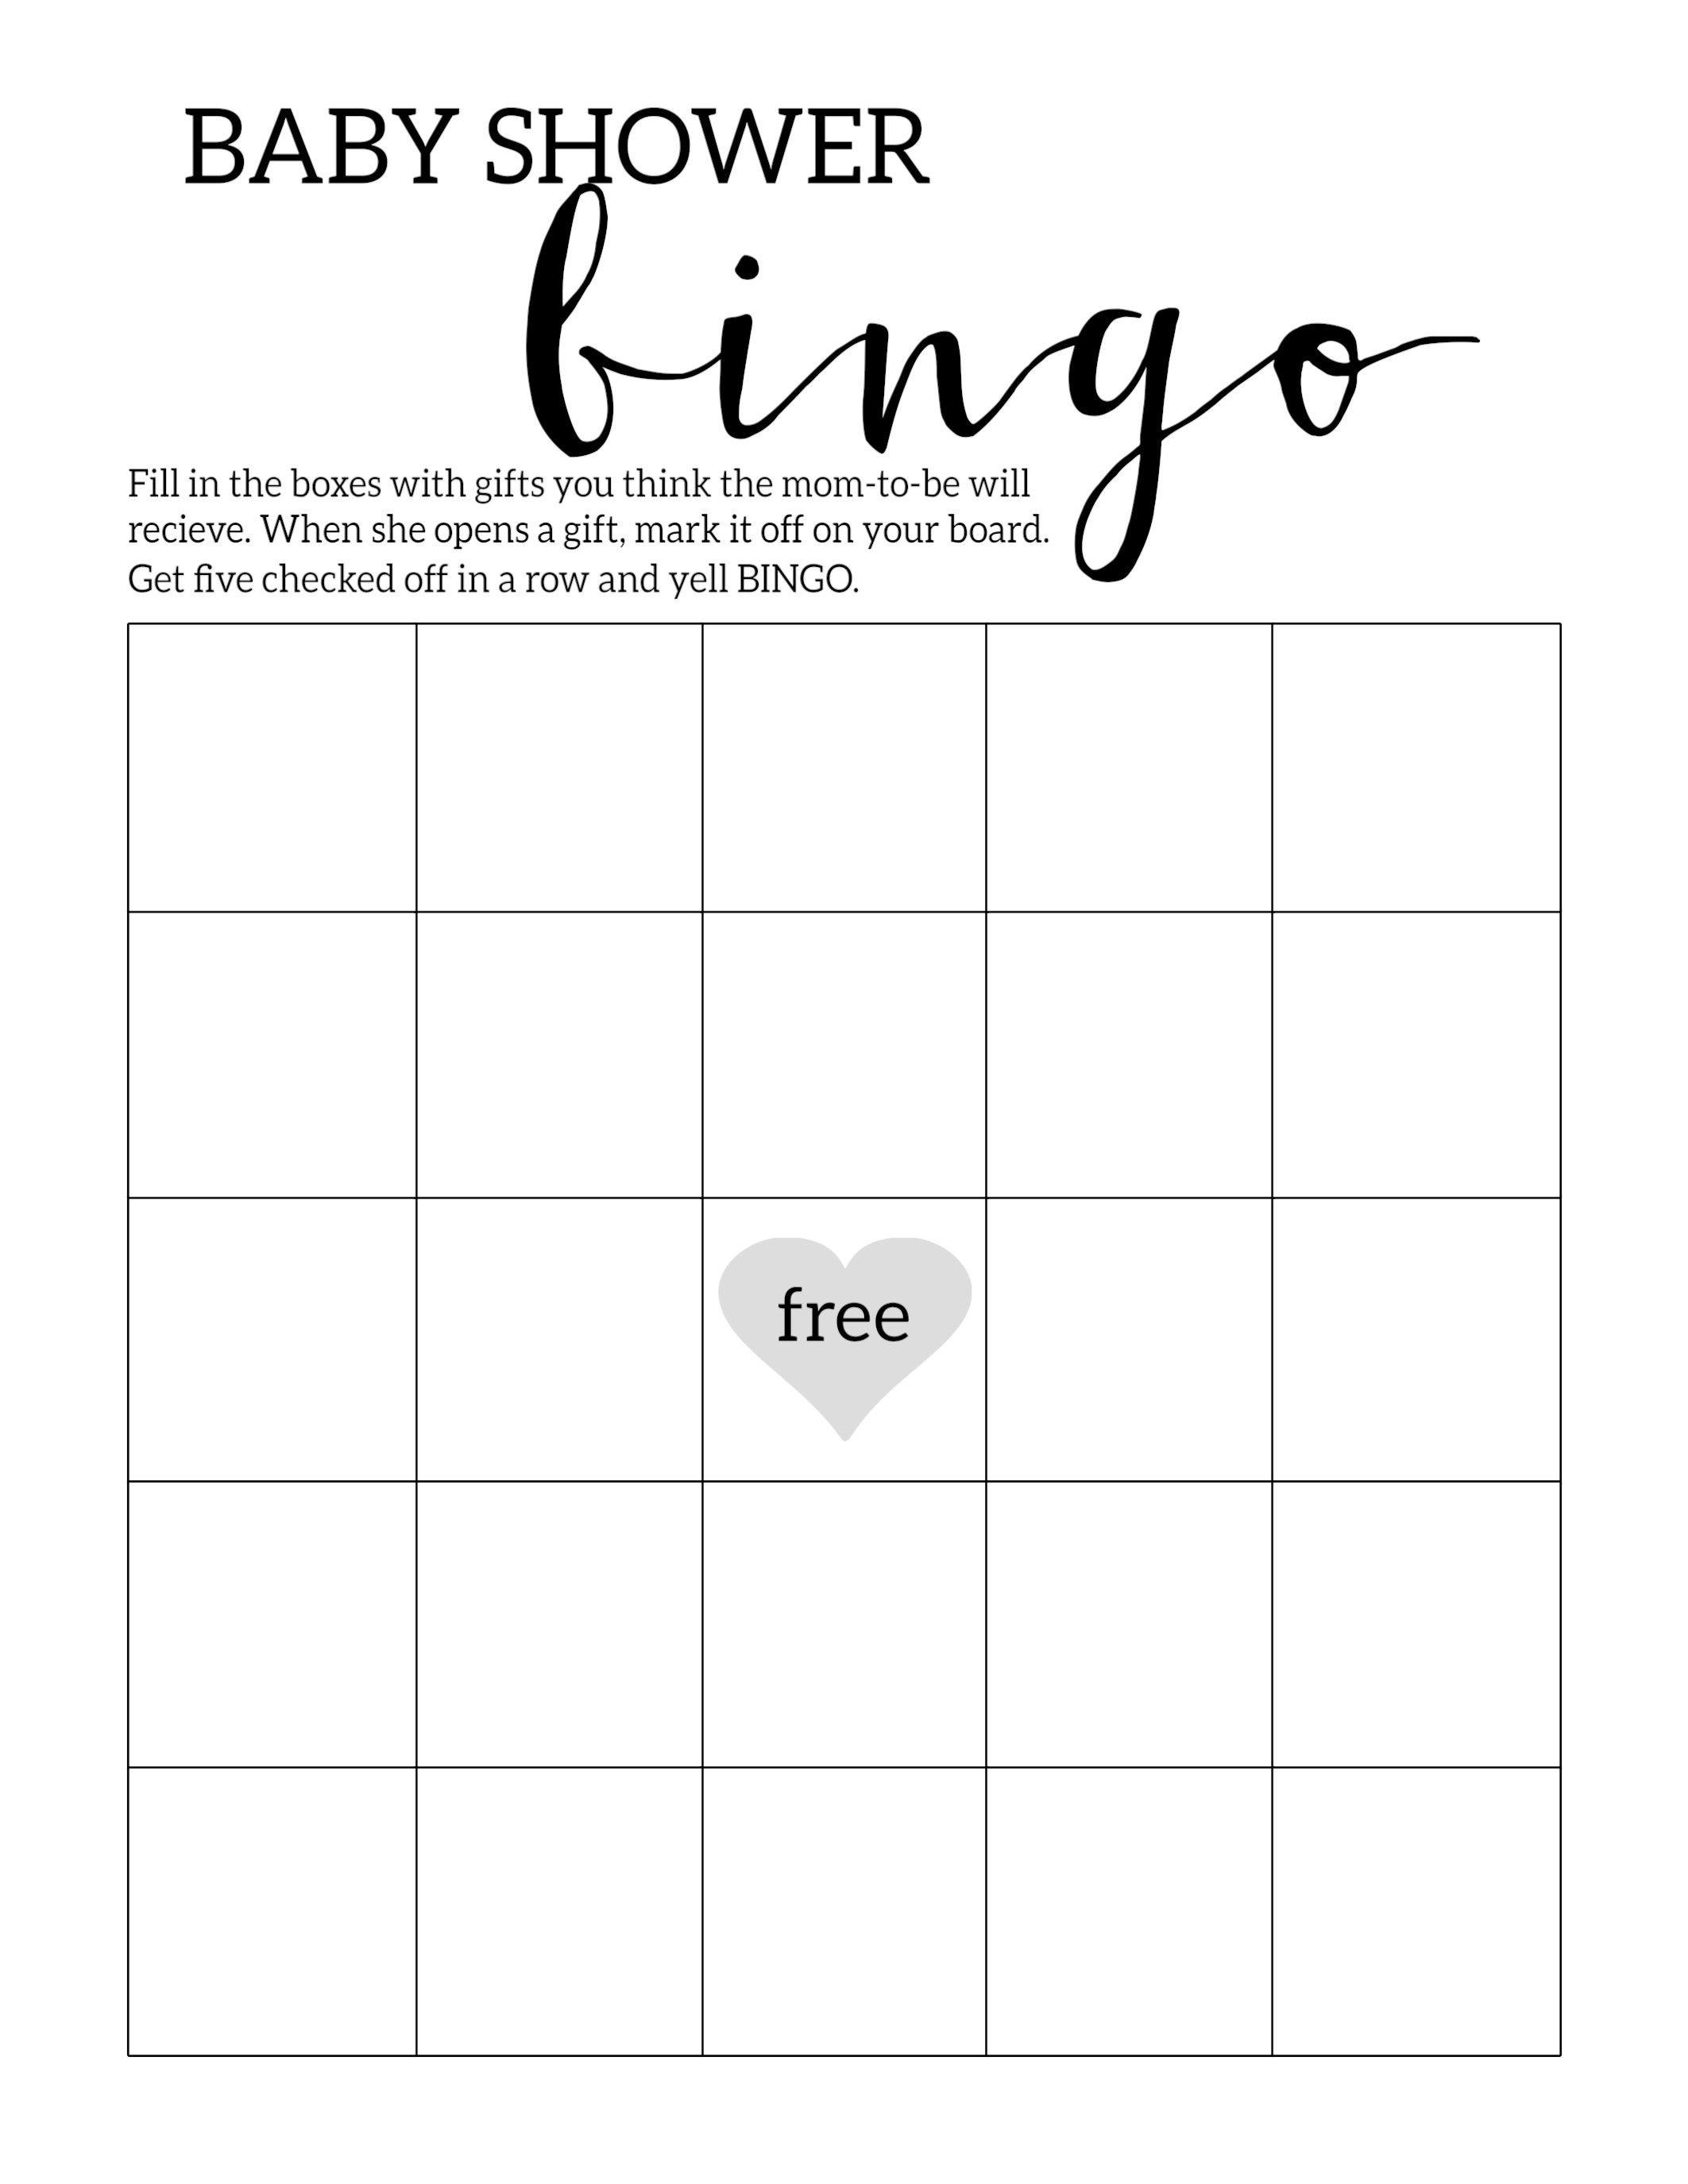 Baby Shower Bingo Printable Cards Template | Baby Shower | Baby - Printable Baby Shower Bingo Games Free